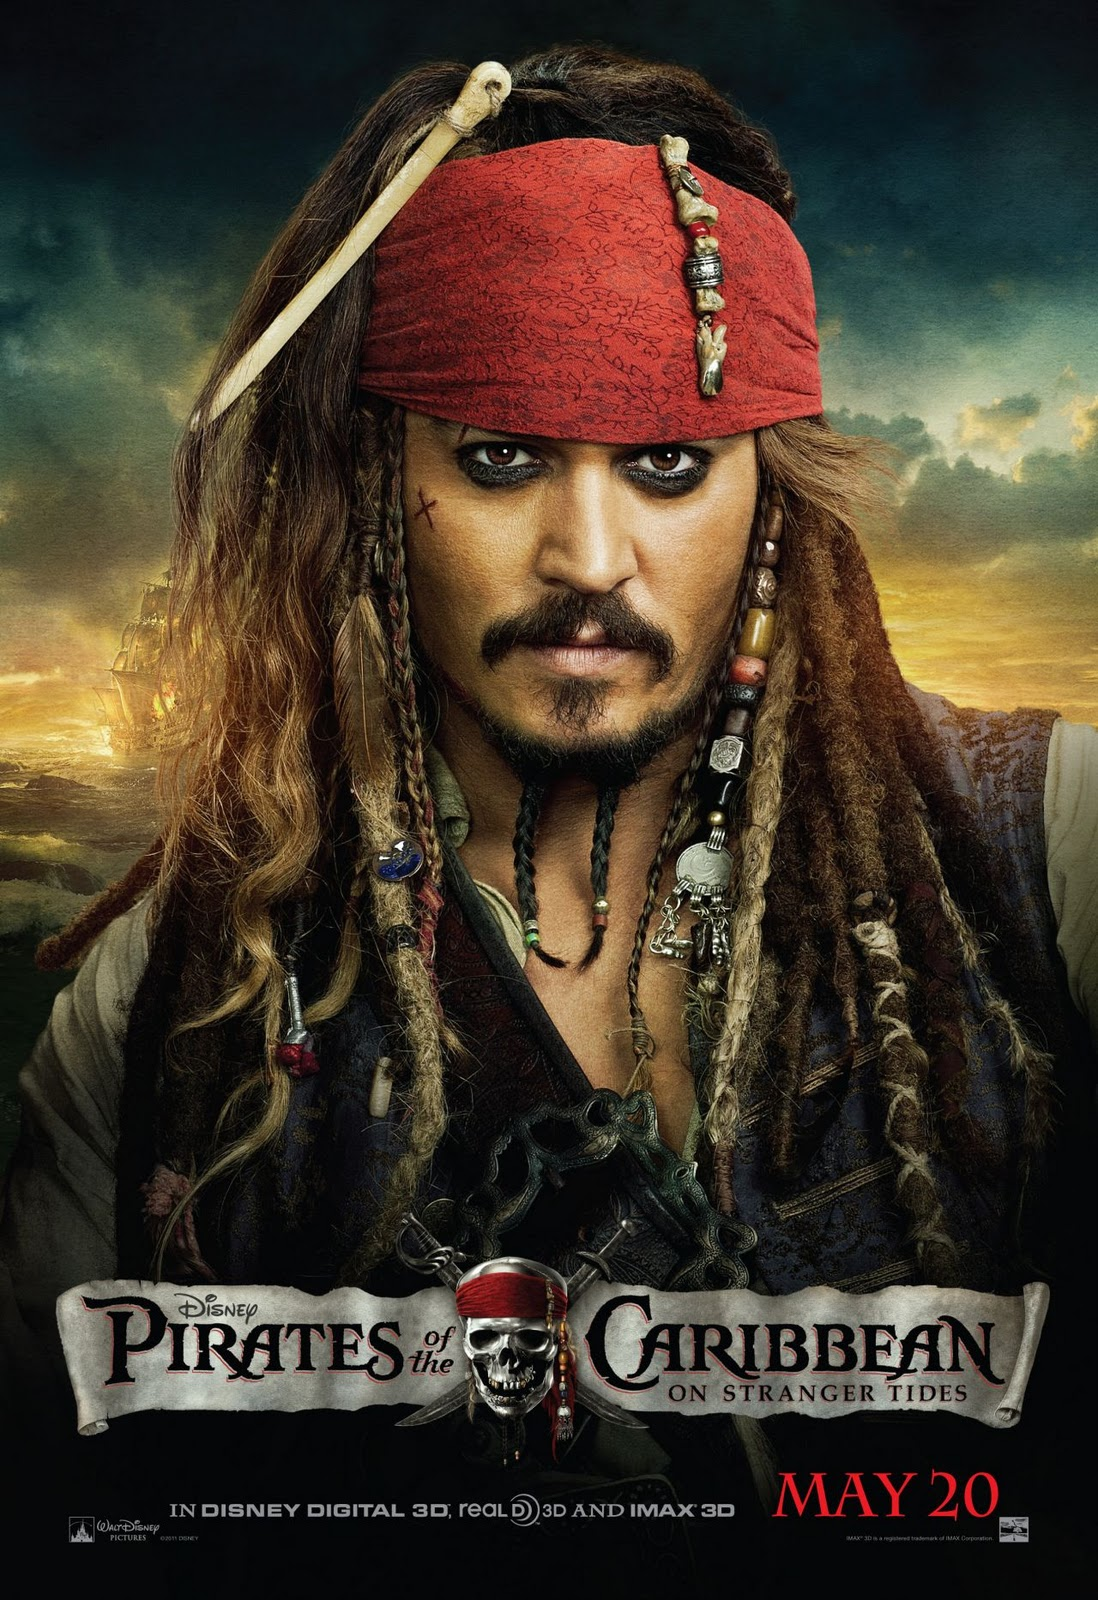 http://4.bp.blogspot.com/-_s84q_1qmNM/TZOvKcTvRbI/AAAAAAAAAb4/ToYewWAp95k/s1600/113_pirates_of_the_caribbean_on_stranger_tides_2011.jpg